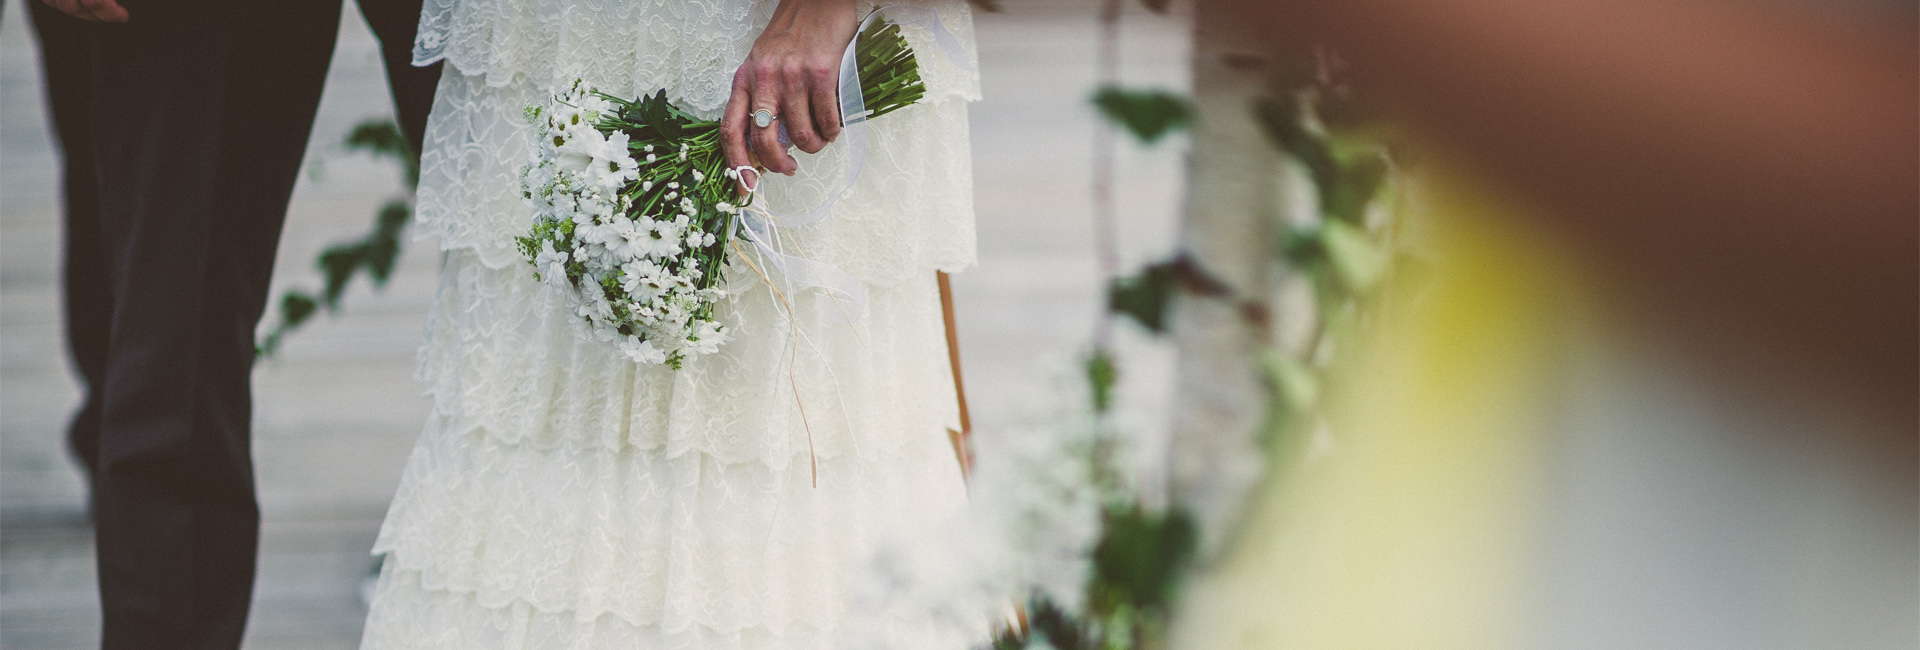 Splňte si svůj sen<br>o krásné svatbě